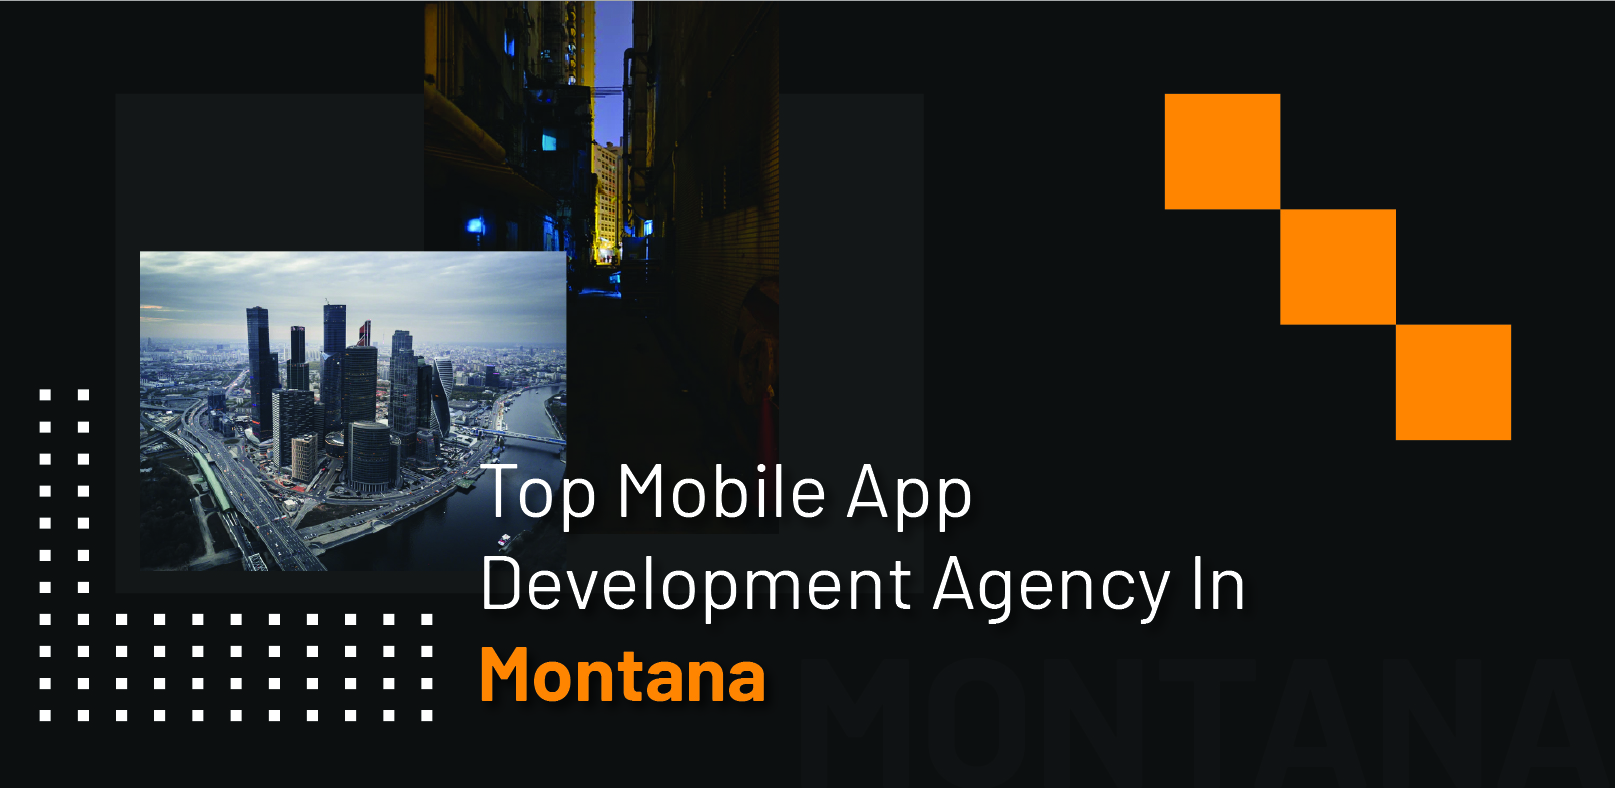 Top Mobile App Development Agency in Montana - WebClues Infotech